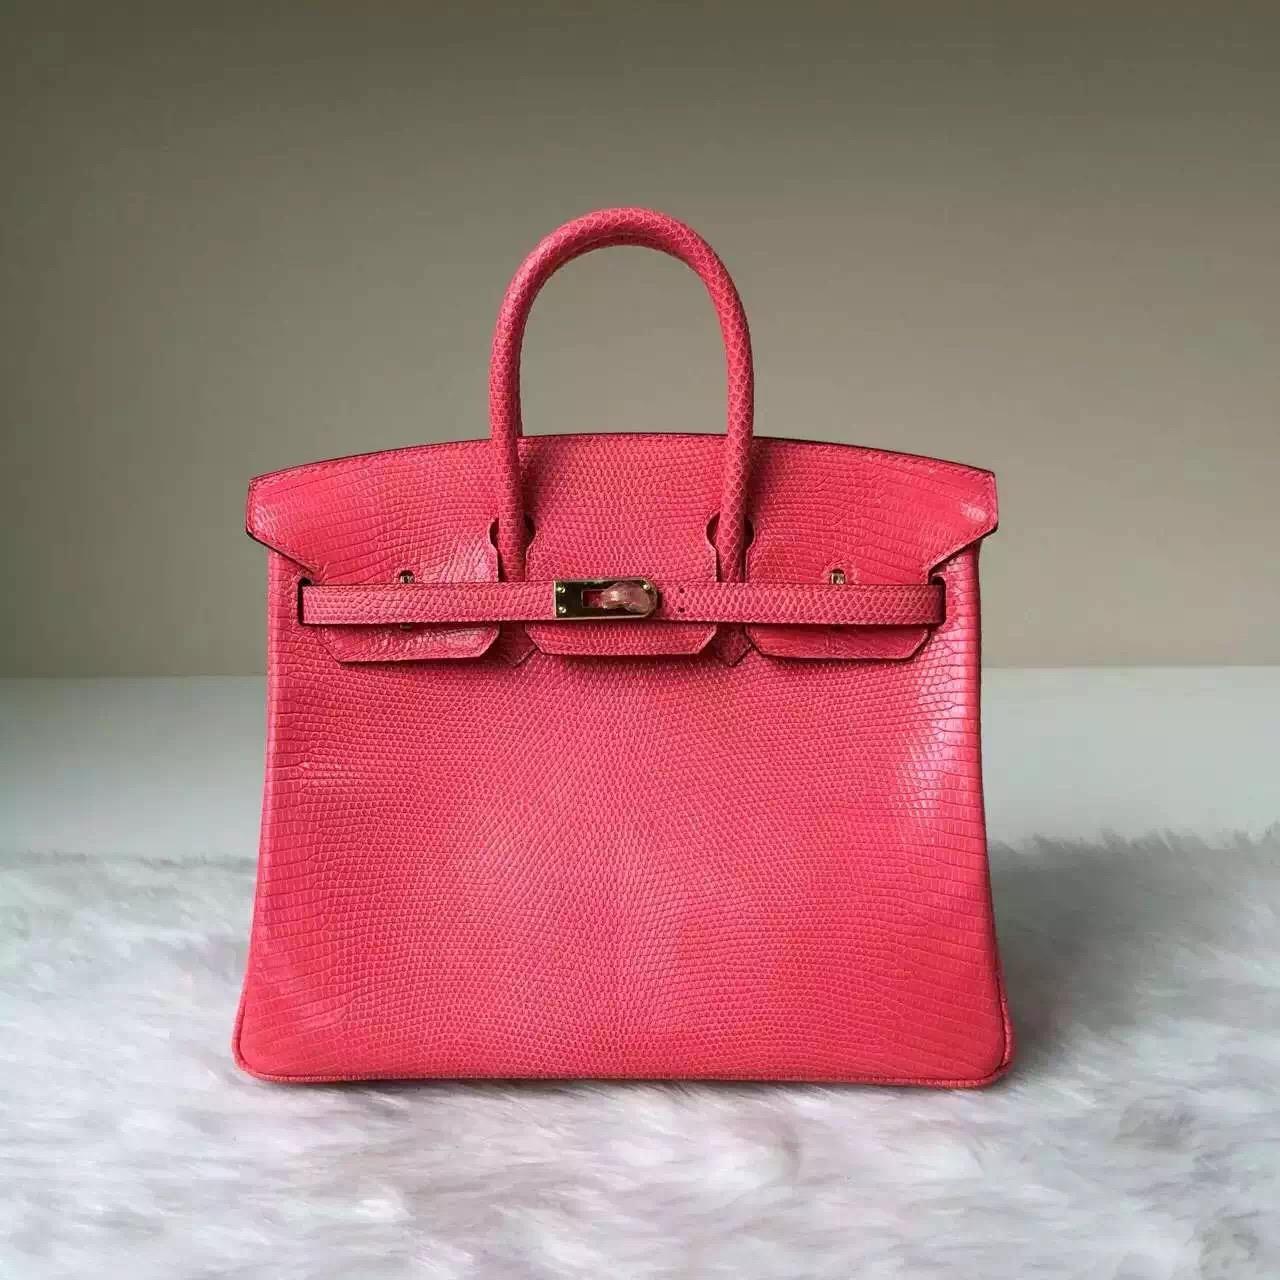 Discount Hermes Lizard Leather Birkin25 Bag in Rose Lipstick